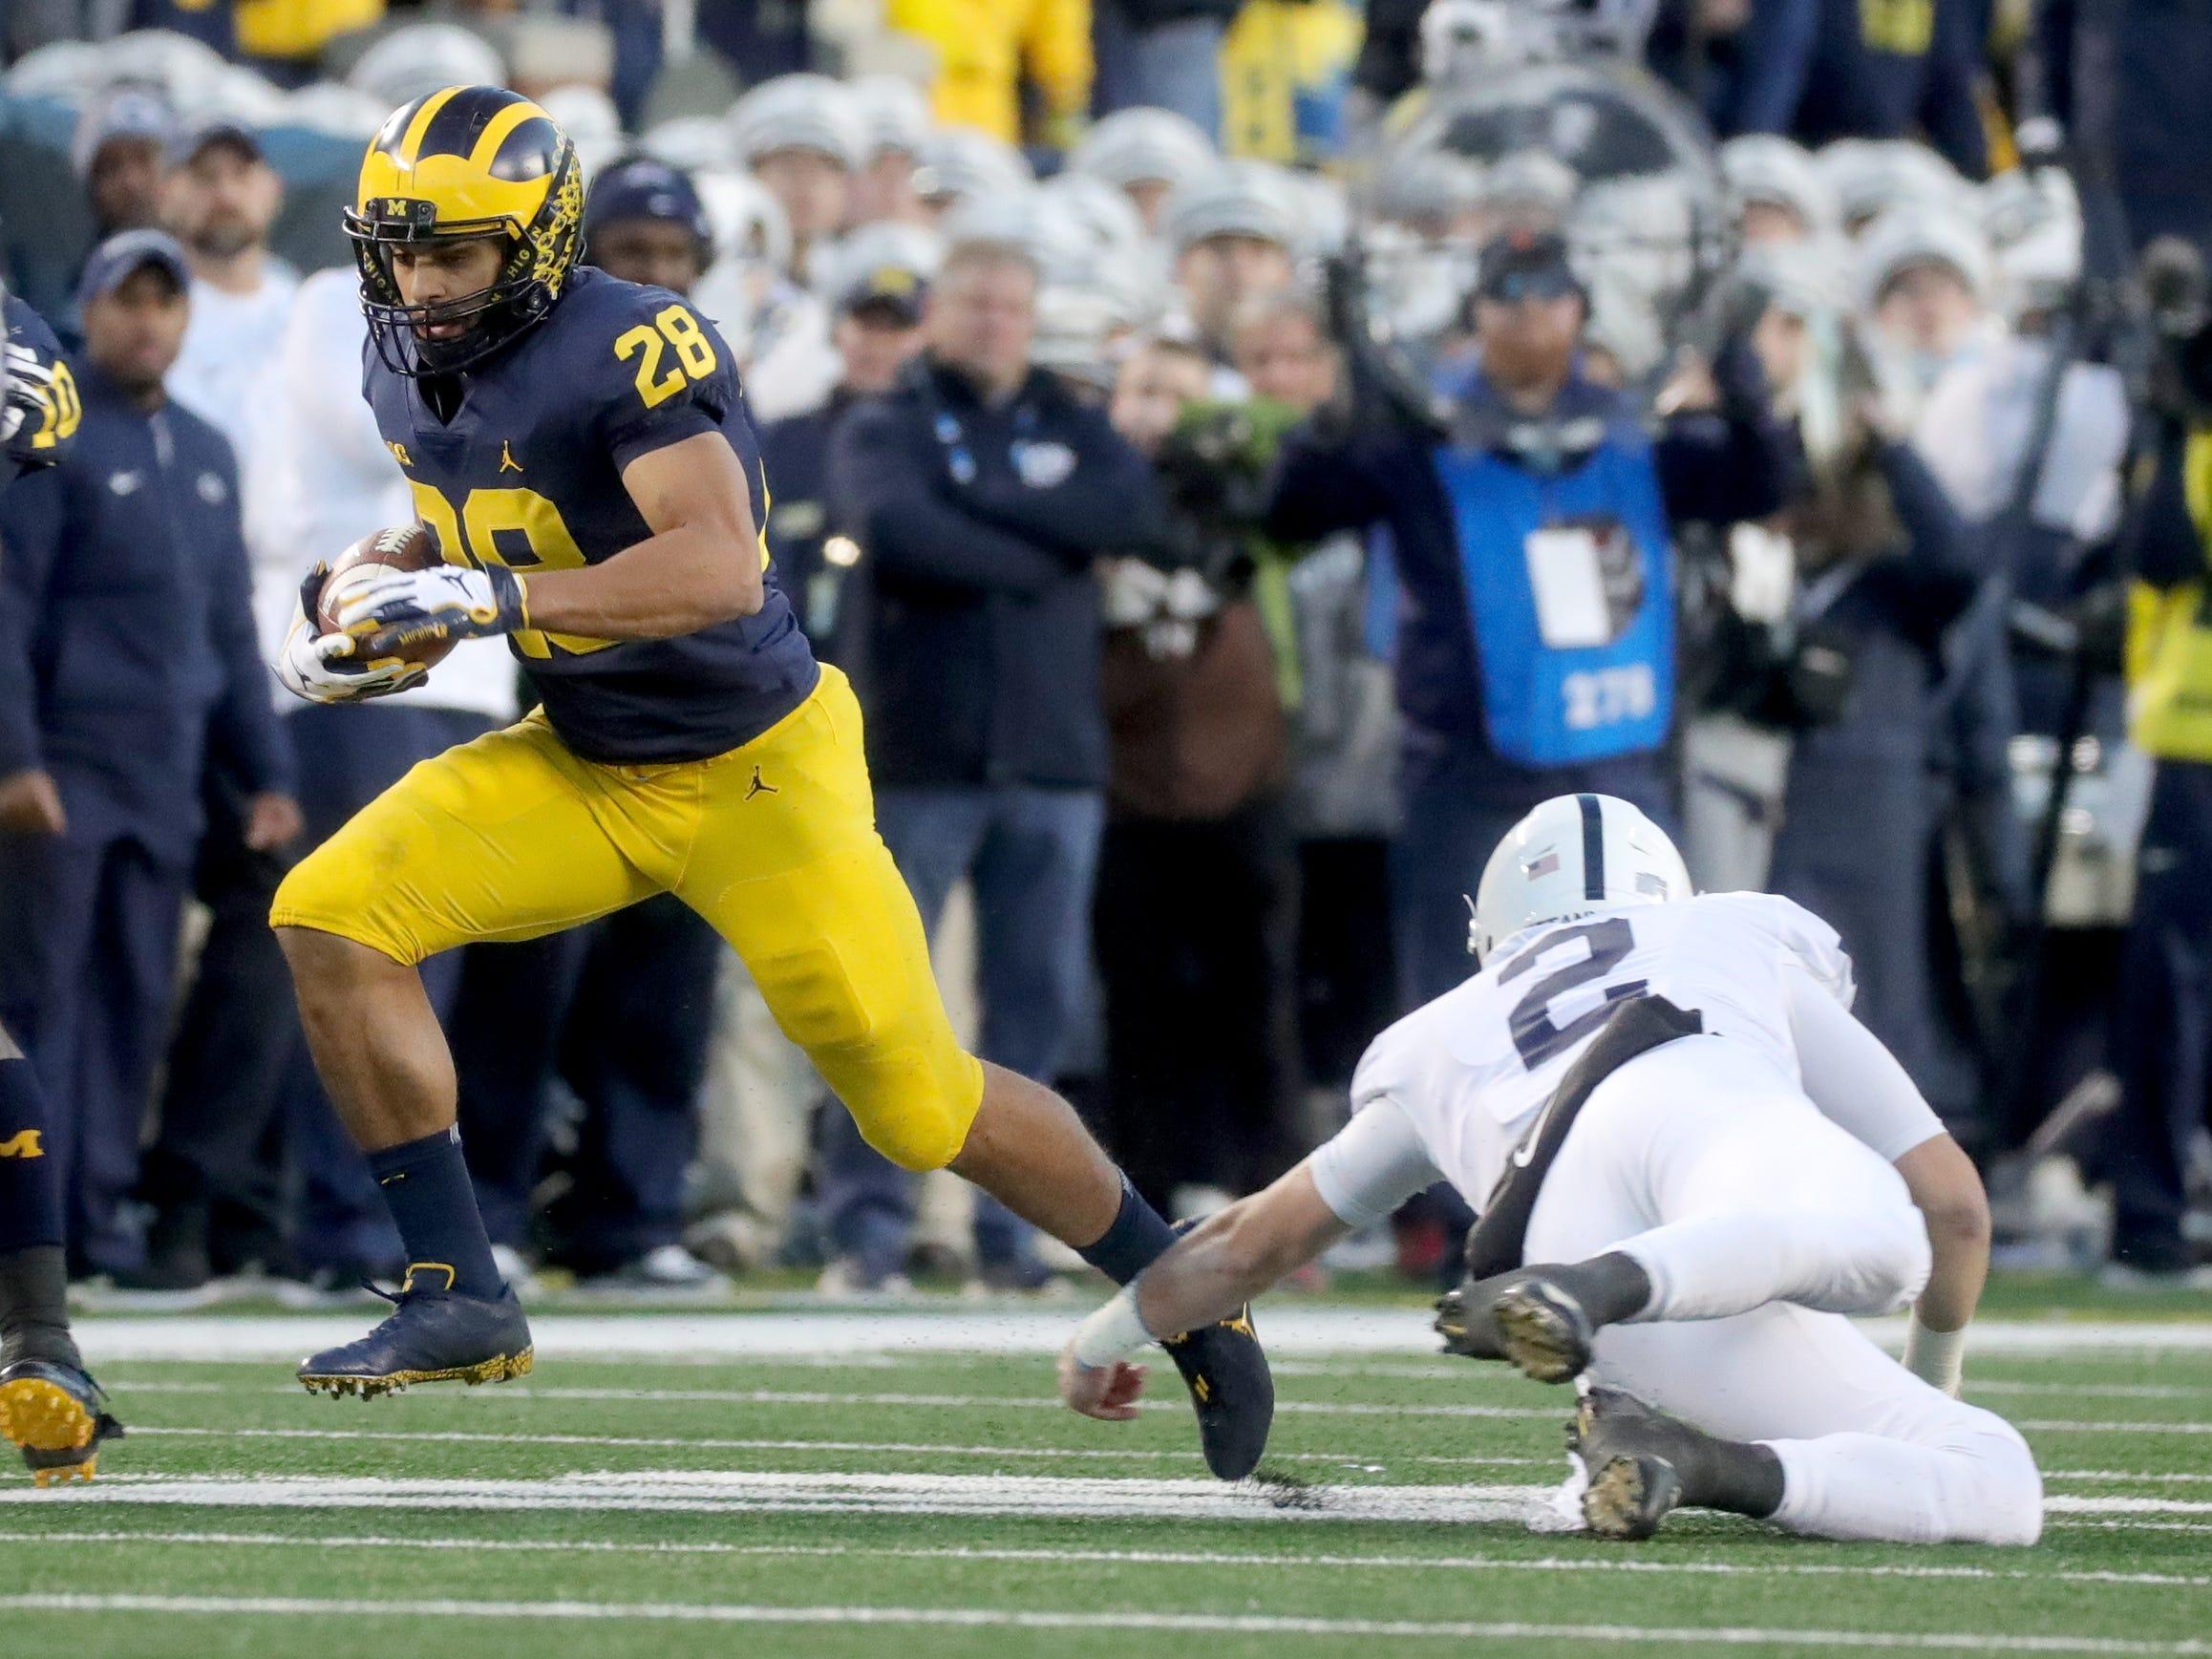 Michigan's Brandon Watson runs past Penn State quarterback Tommy Stevens to return an interception 62 yards for a touchdown in the second half Saturday, Nov. 3, 2018 at Michigan Stadium in Ann Arbor.